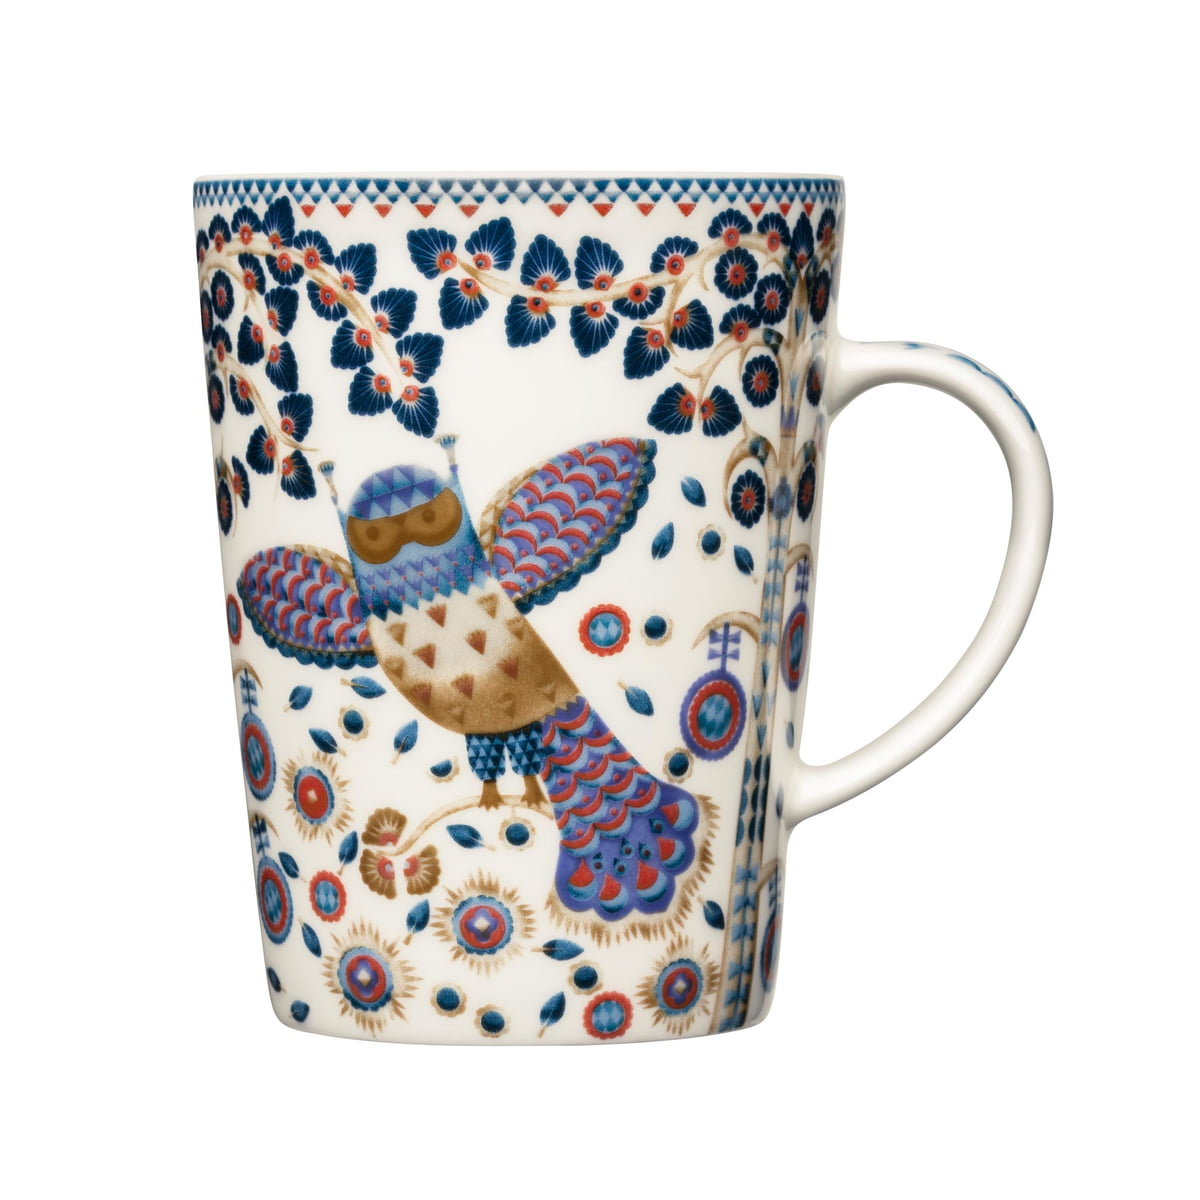 taika mug (anniversary edition) by iittala - taika mug with handle anniversary edition by iittala in white